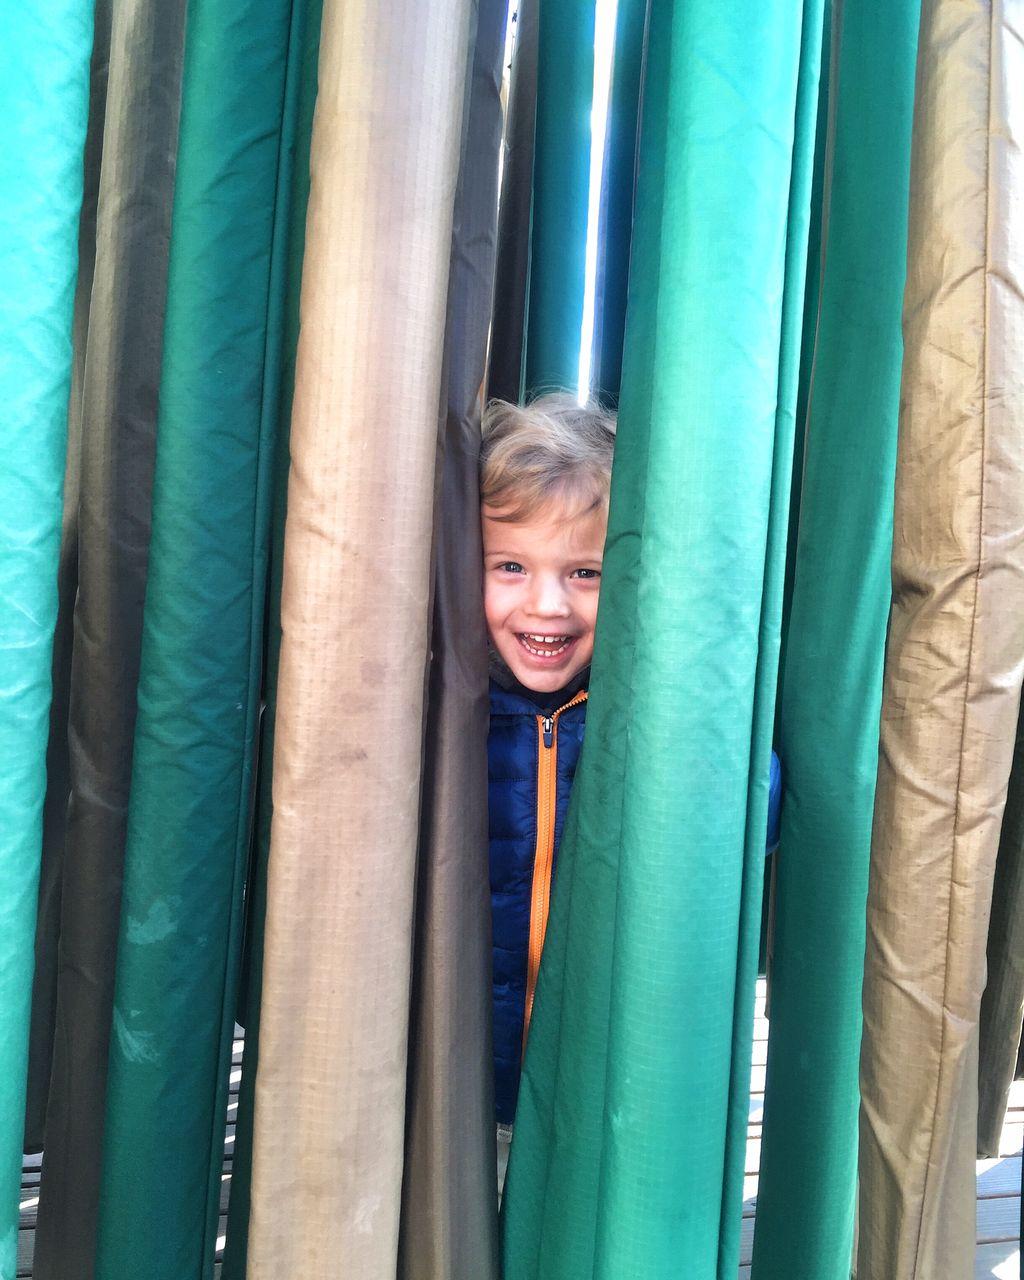 Portrait of happy boy peeking through fabrics